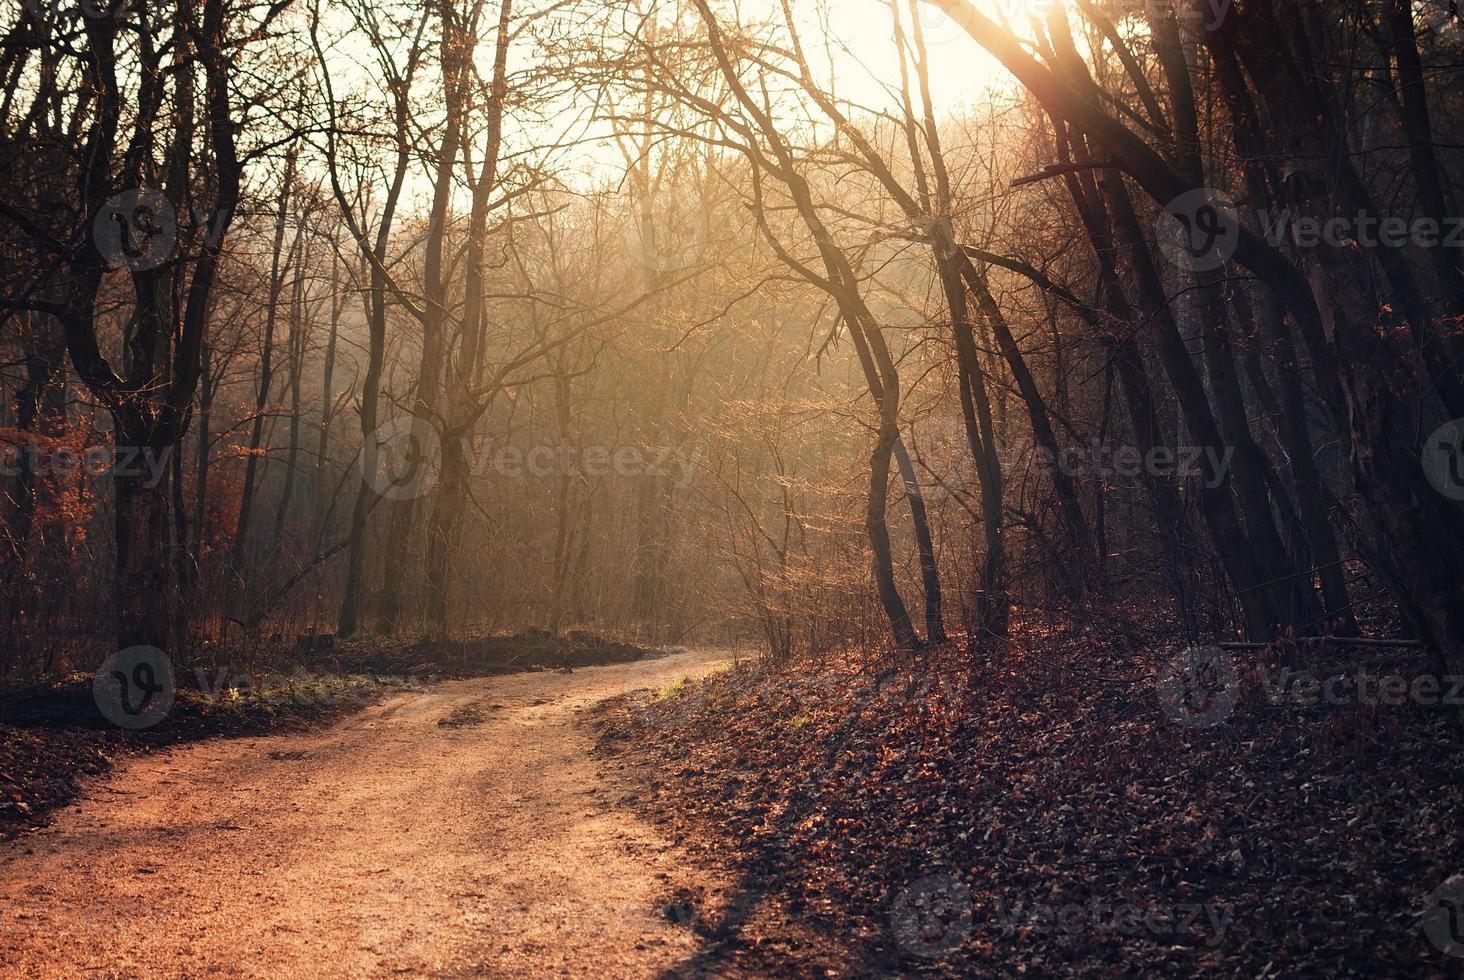 Fußweg im Wald foto